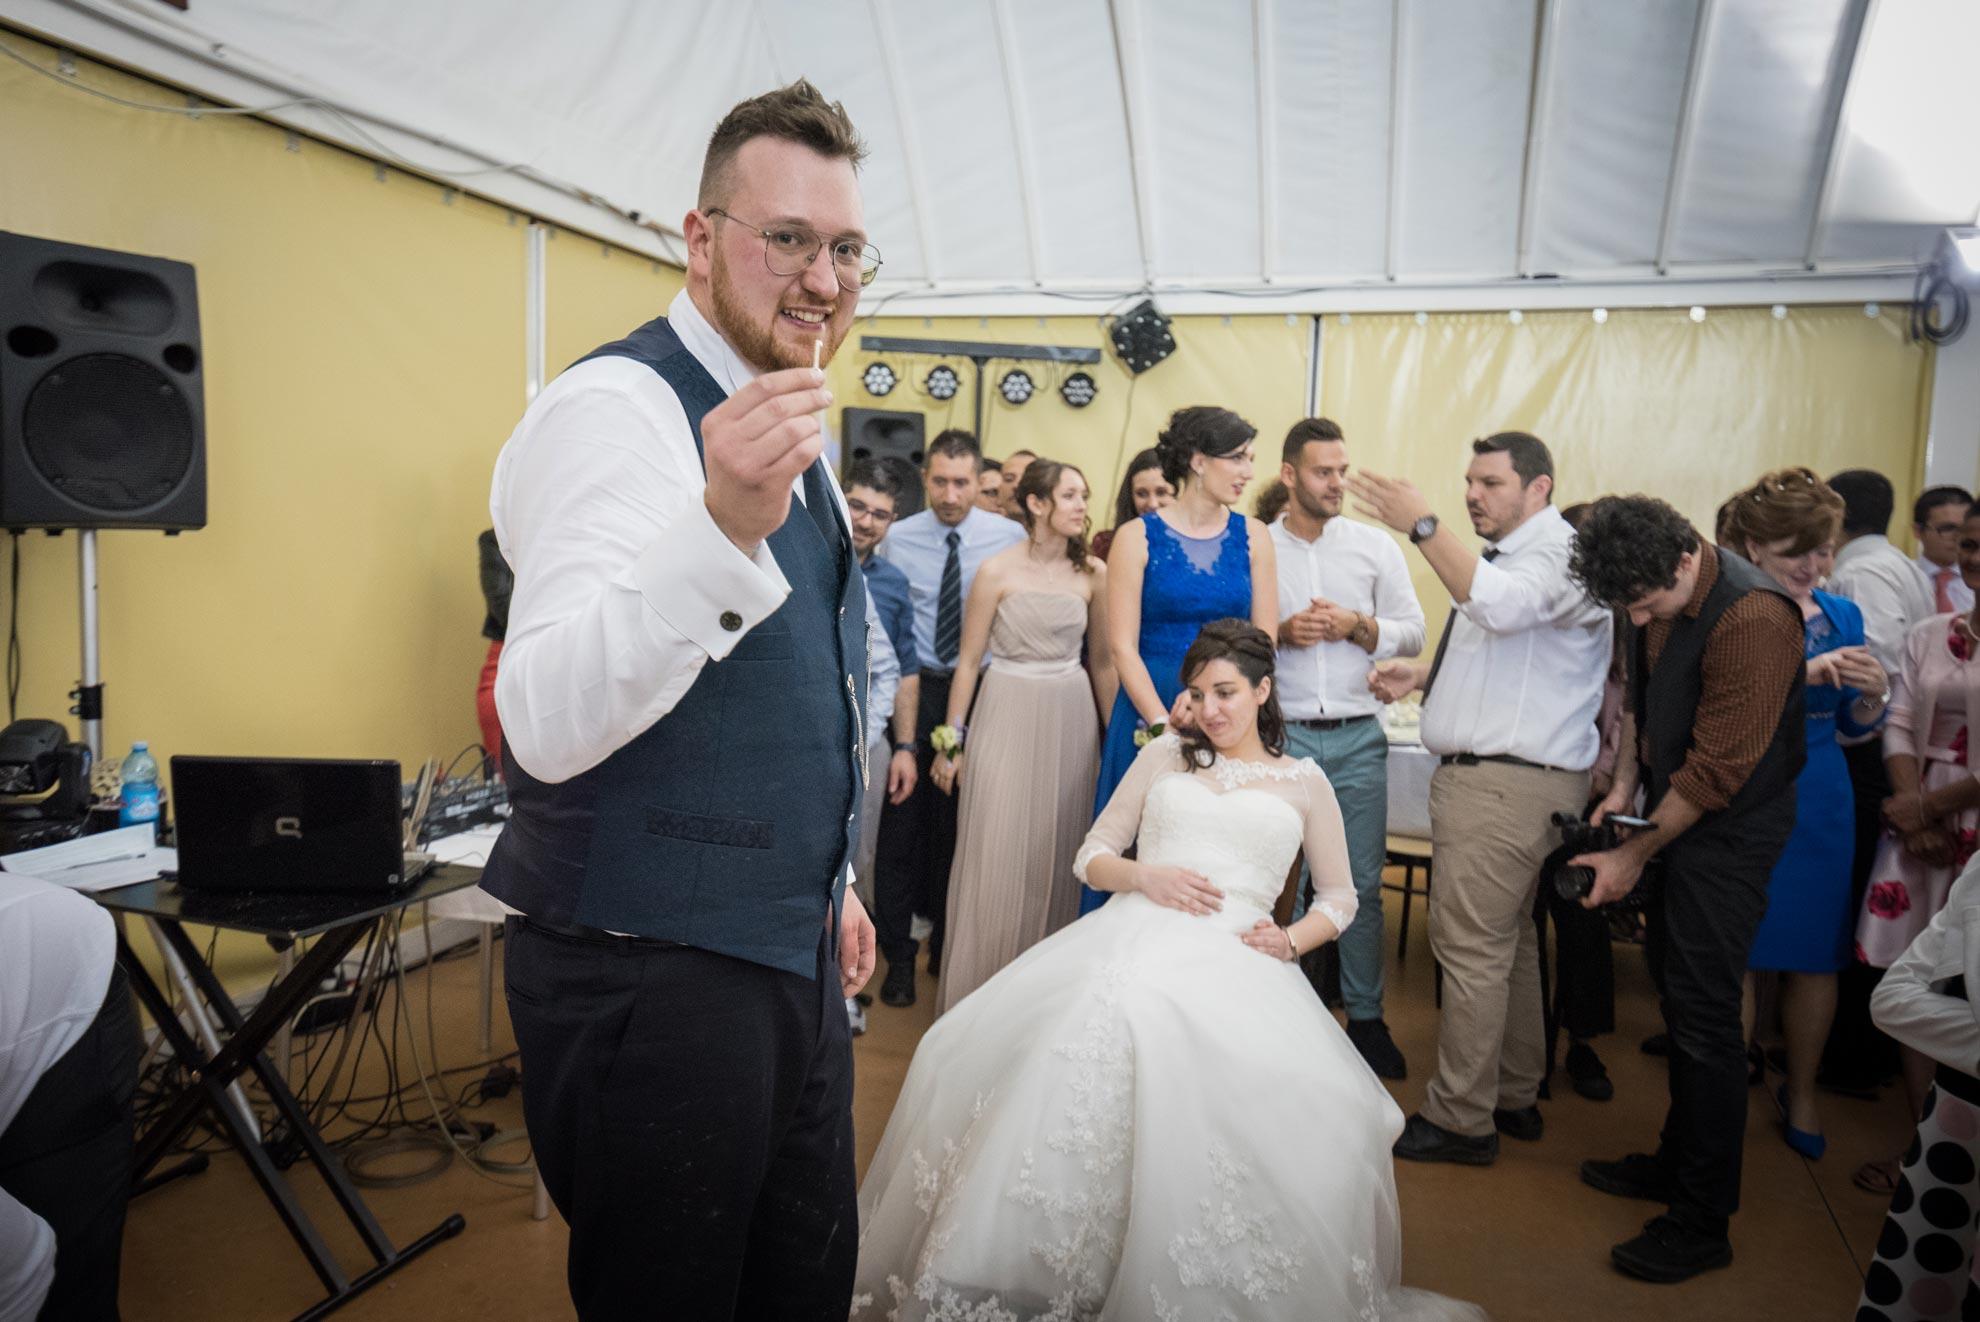 Matrimonio a Narzole Lorenza Diego - DSC 0851 - Fotografo matrimonio Sposi - Fotografo matrimonio Sposi